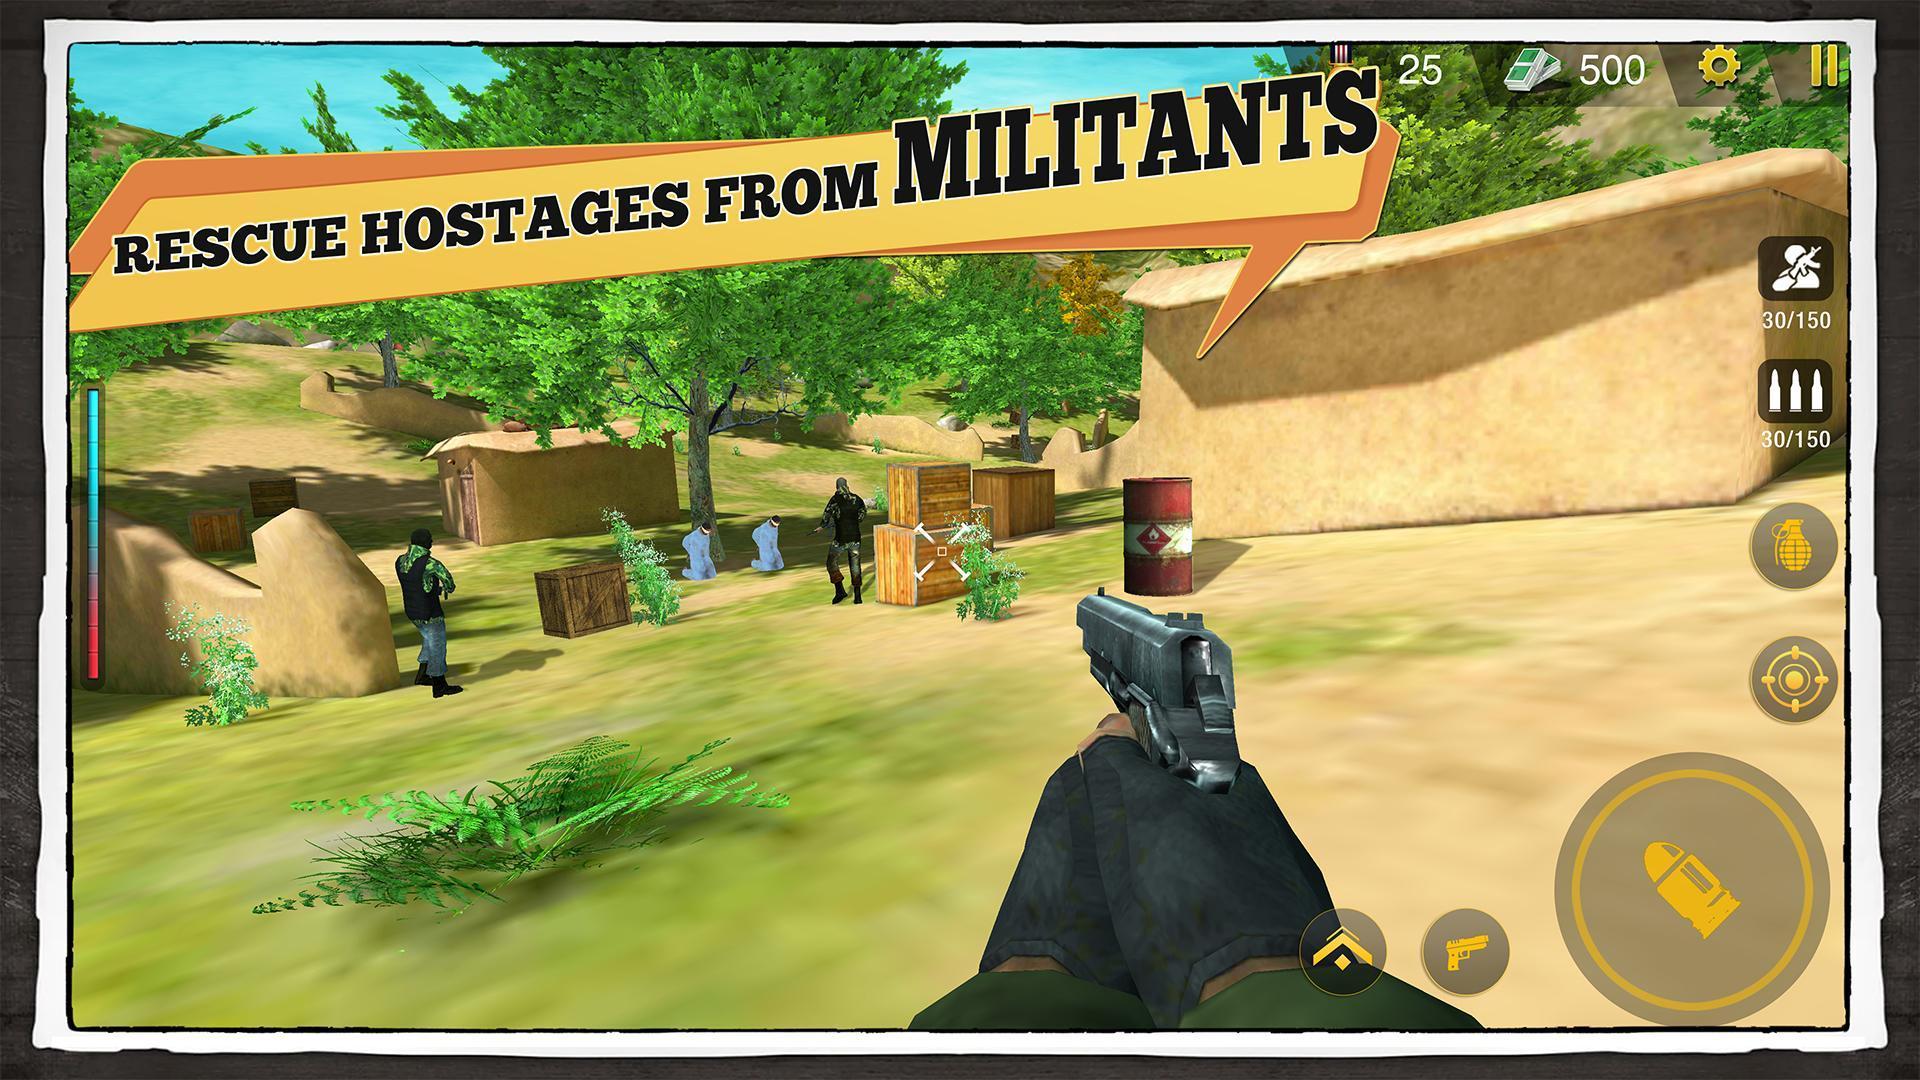 Yalghaar Delta IGI Commando Adventure Mobile Game 3.4 Screenshot 10